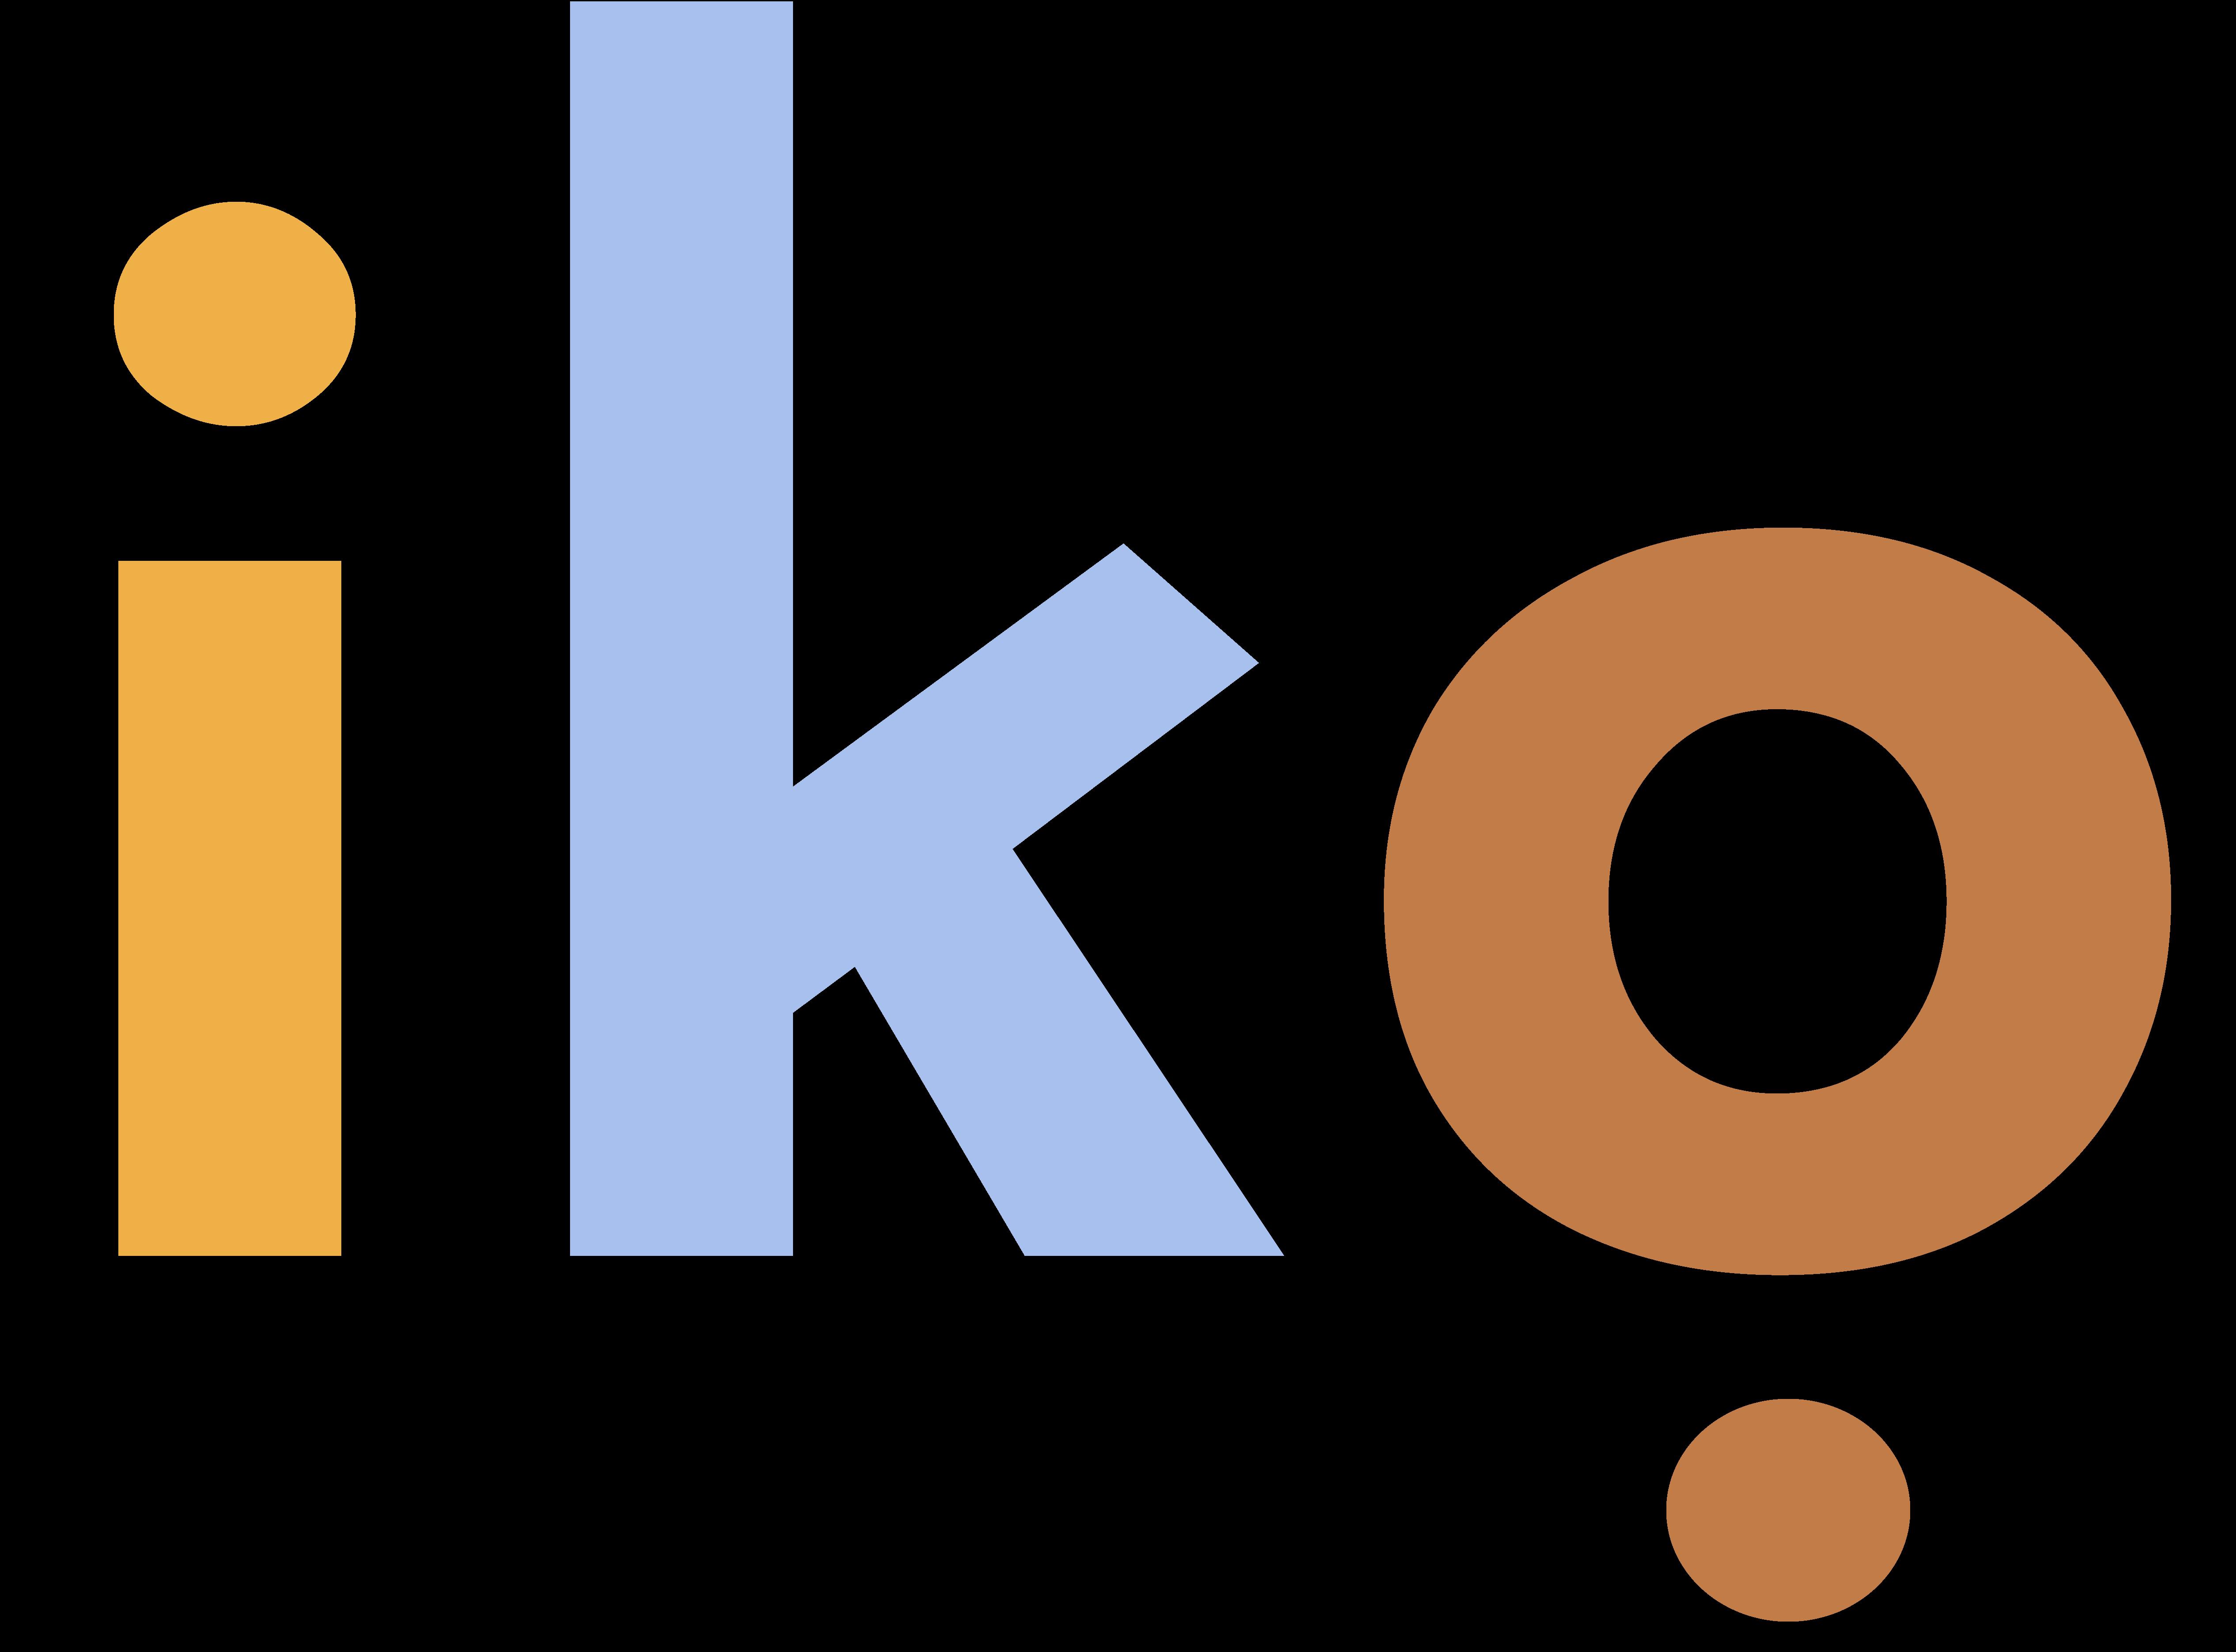 Iko logo in yellow, periwinkle, and terra cotta